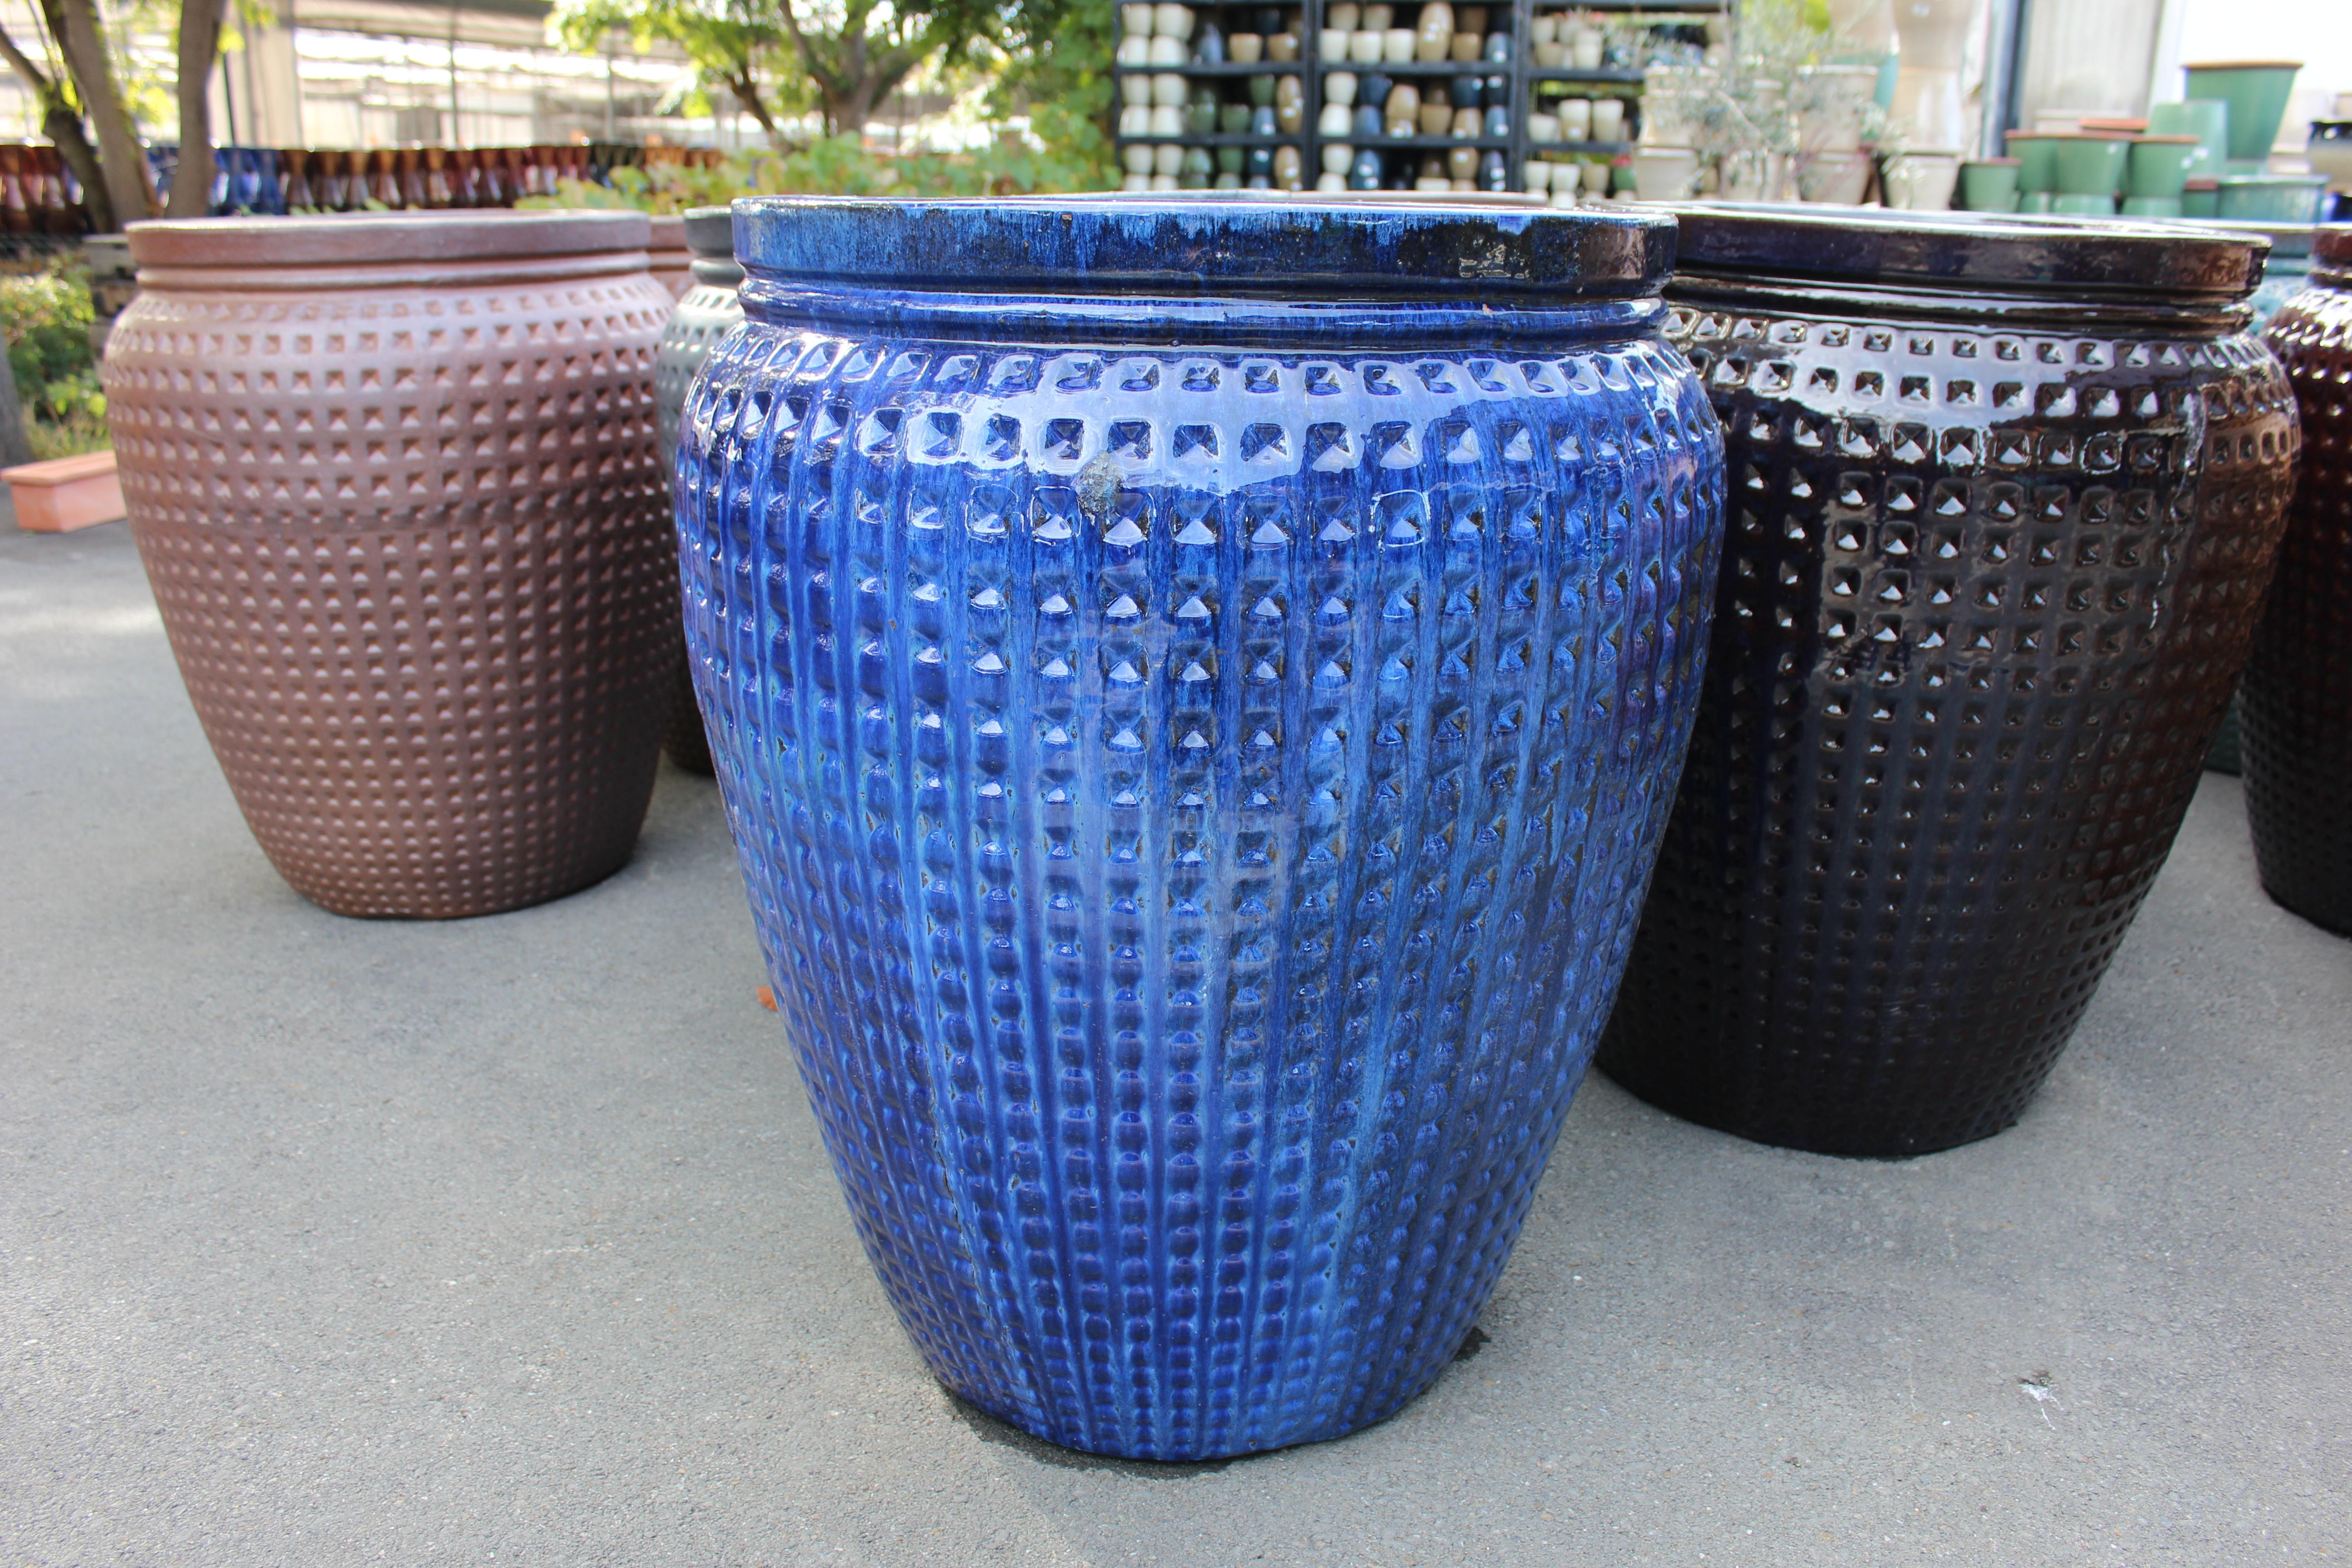 XL Dimpled Water Jar